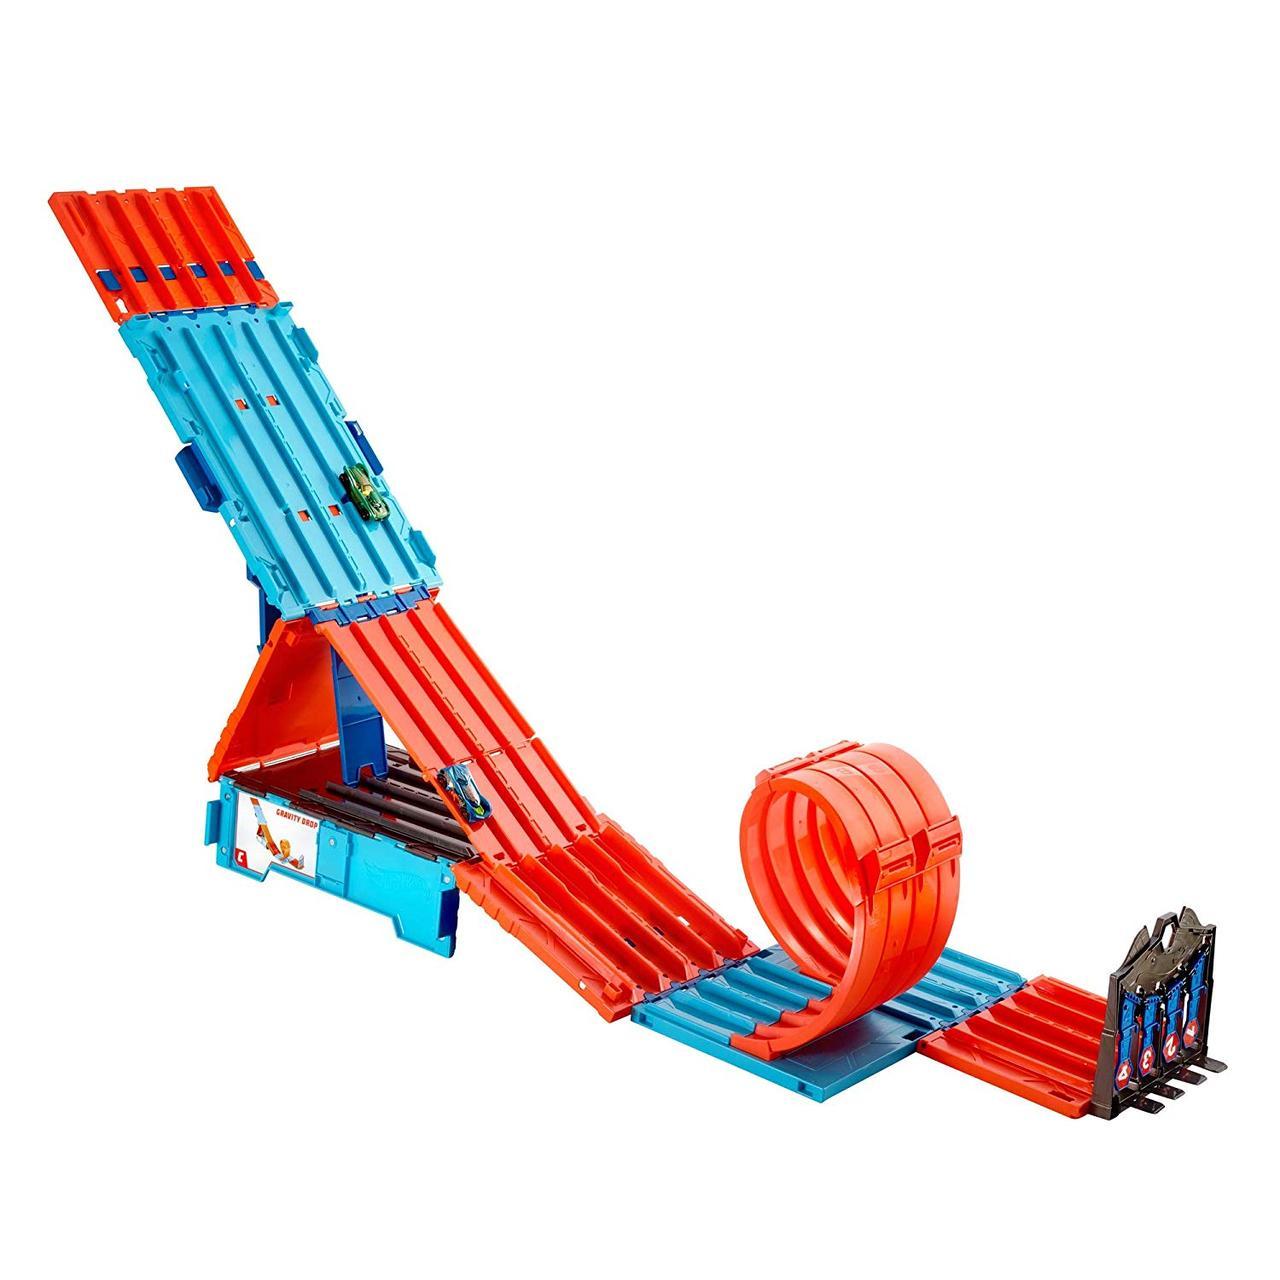 Трек Hot Wheels Хот Вілс Екстремальні гонки Track System Builder Race Crate